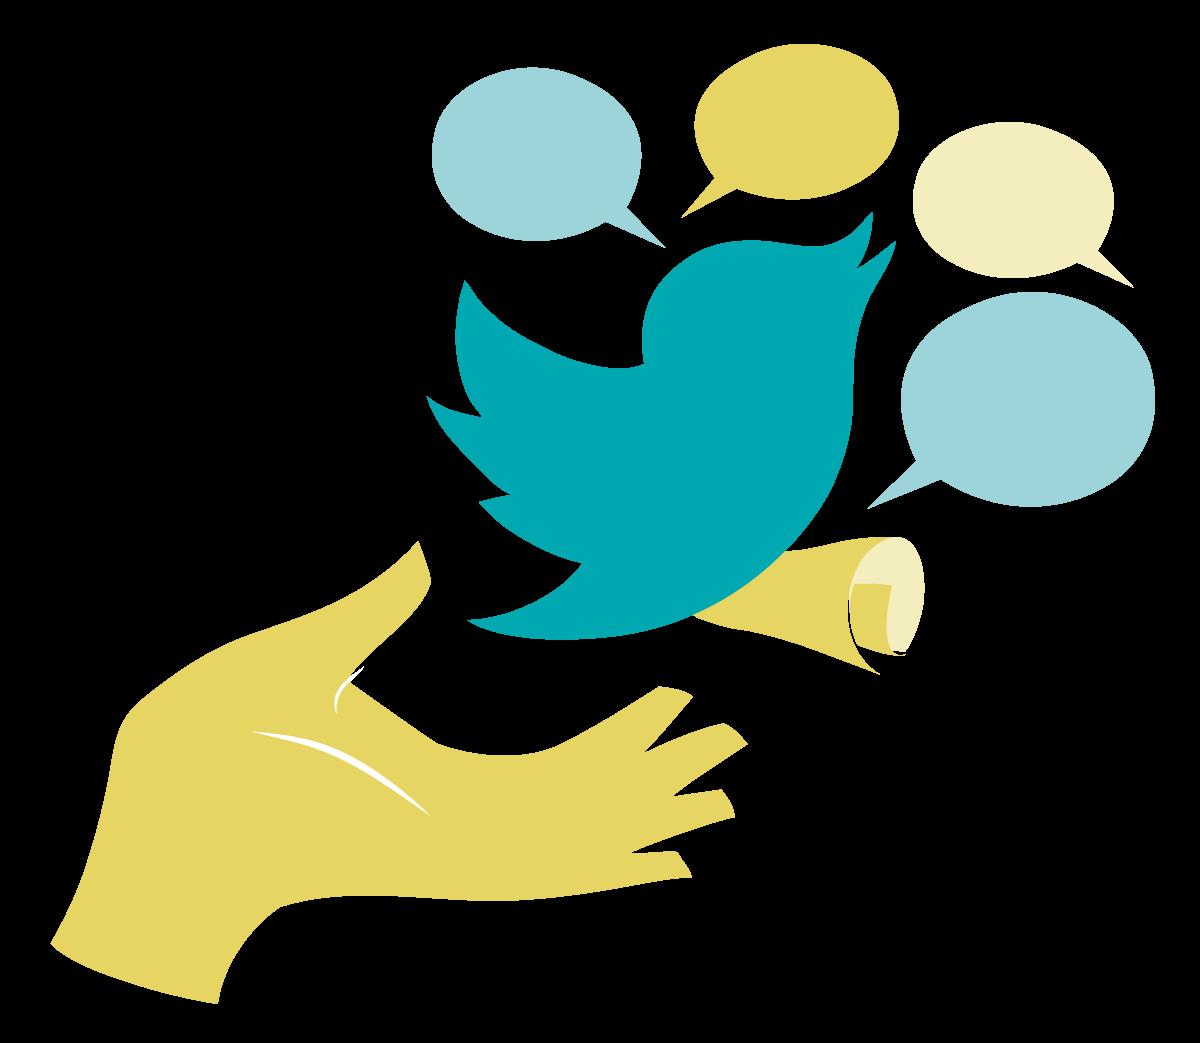 Free Vector Twitter Clipart.  - Twitter Clipart